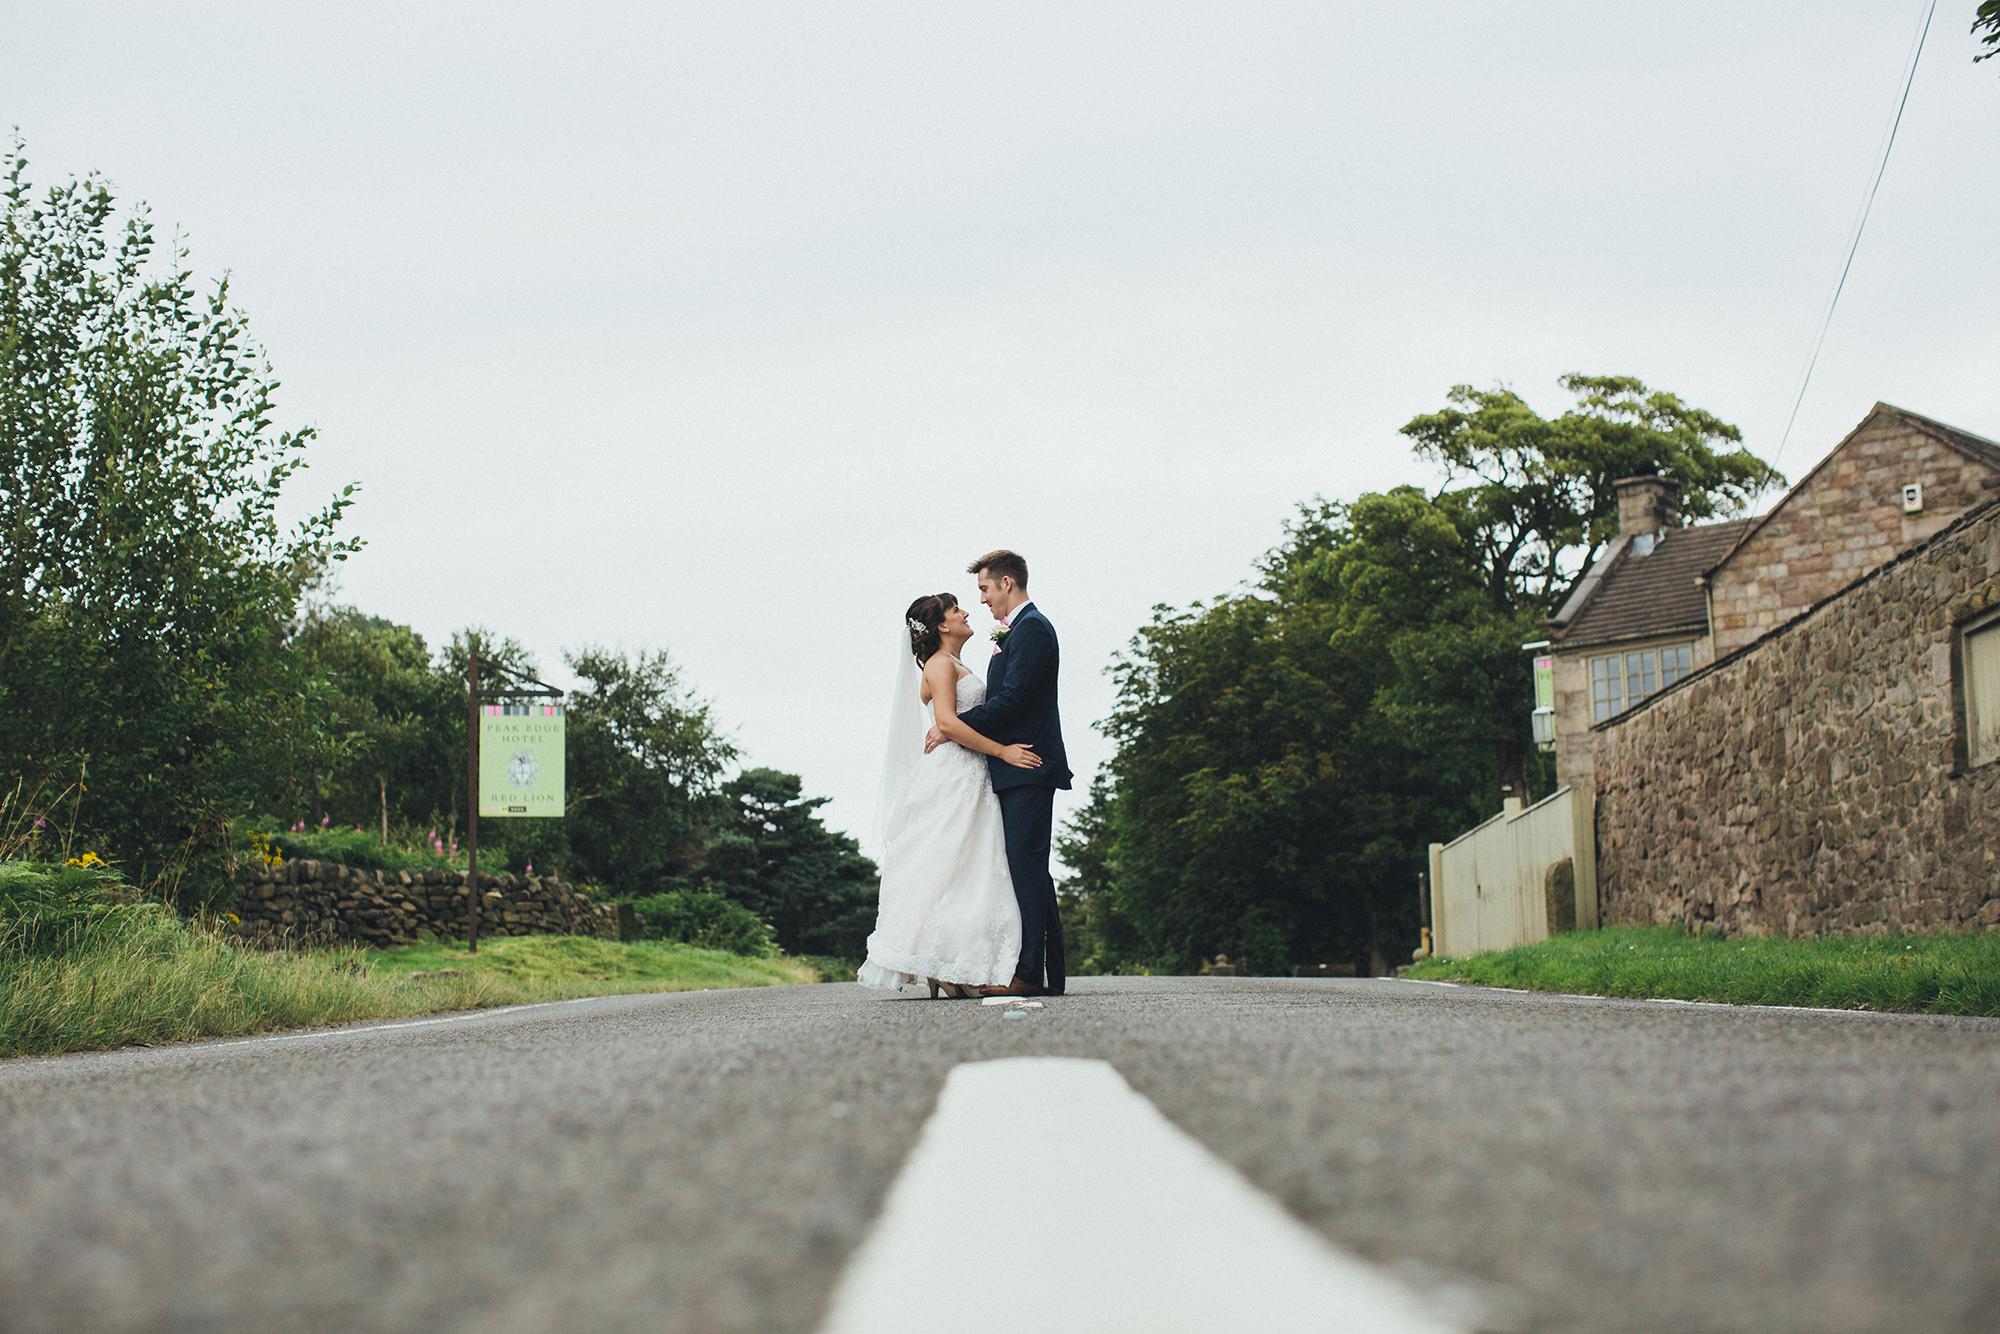 peak edge wedding photographers38.jpg